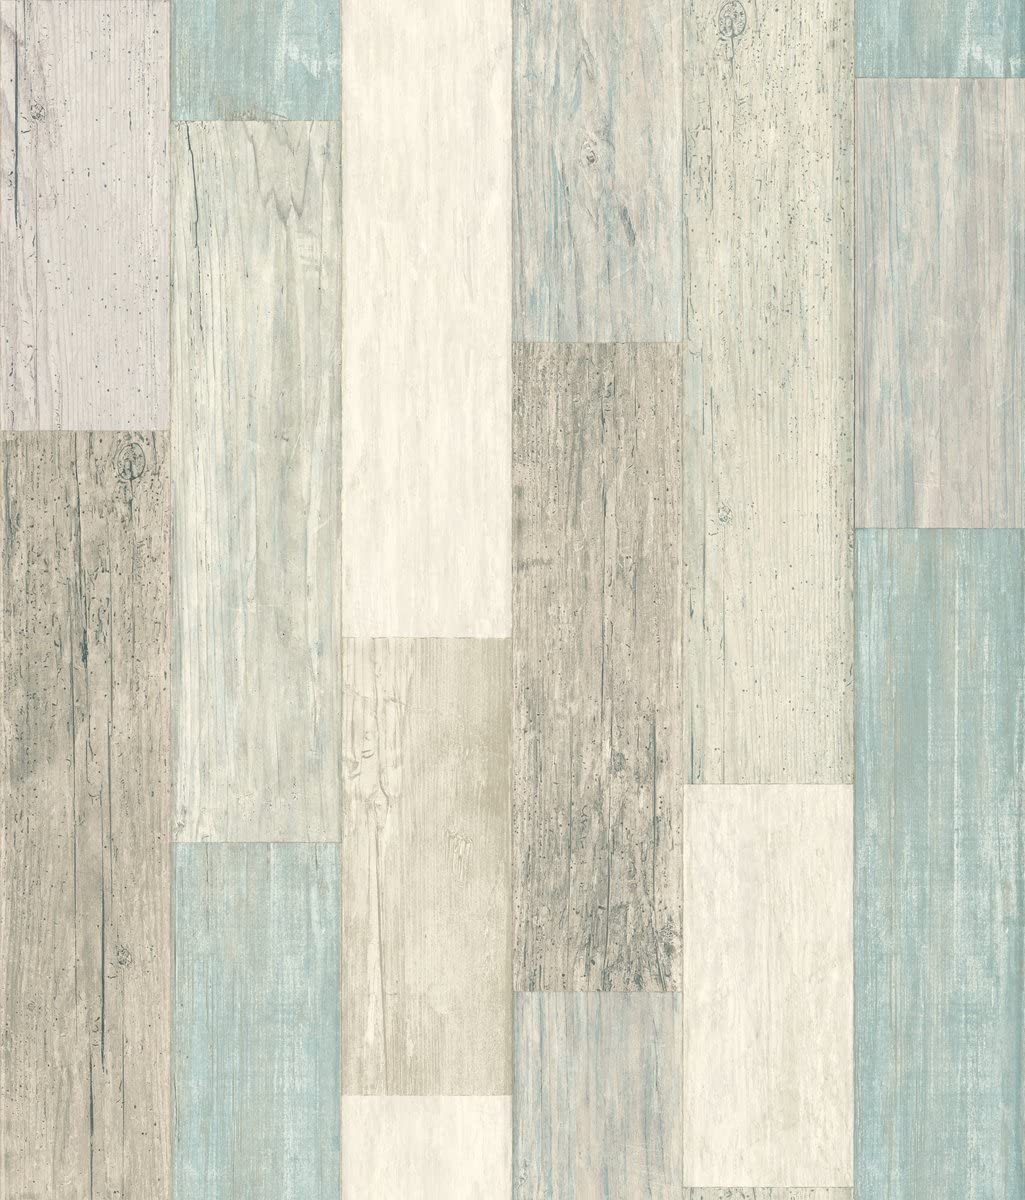 RoomMates Coastal Weathered Plank Blue & Tan Peel and Stick Wallpaper